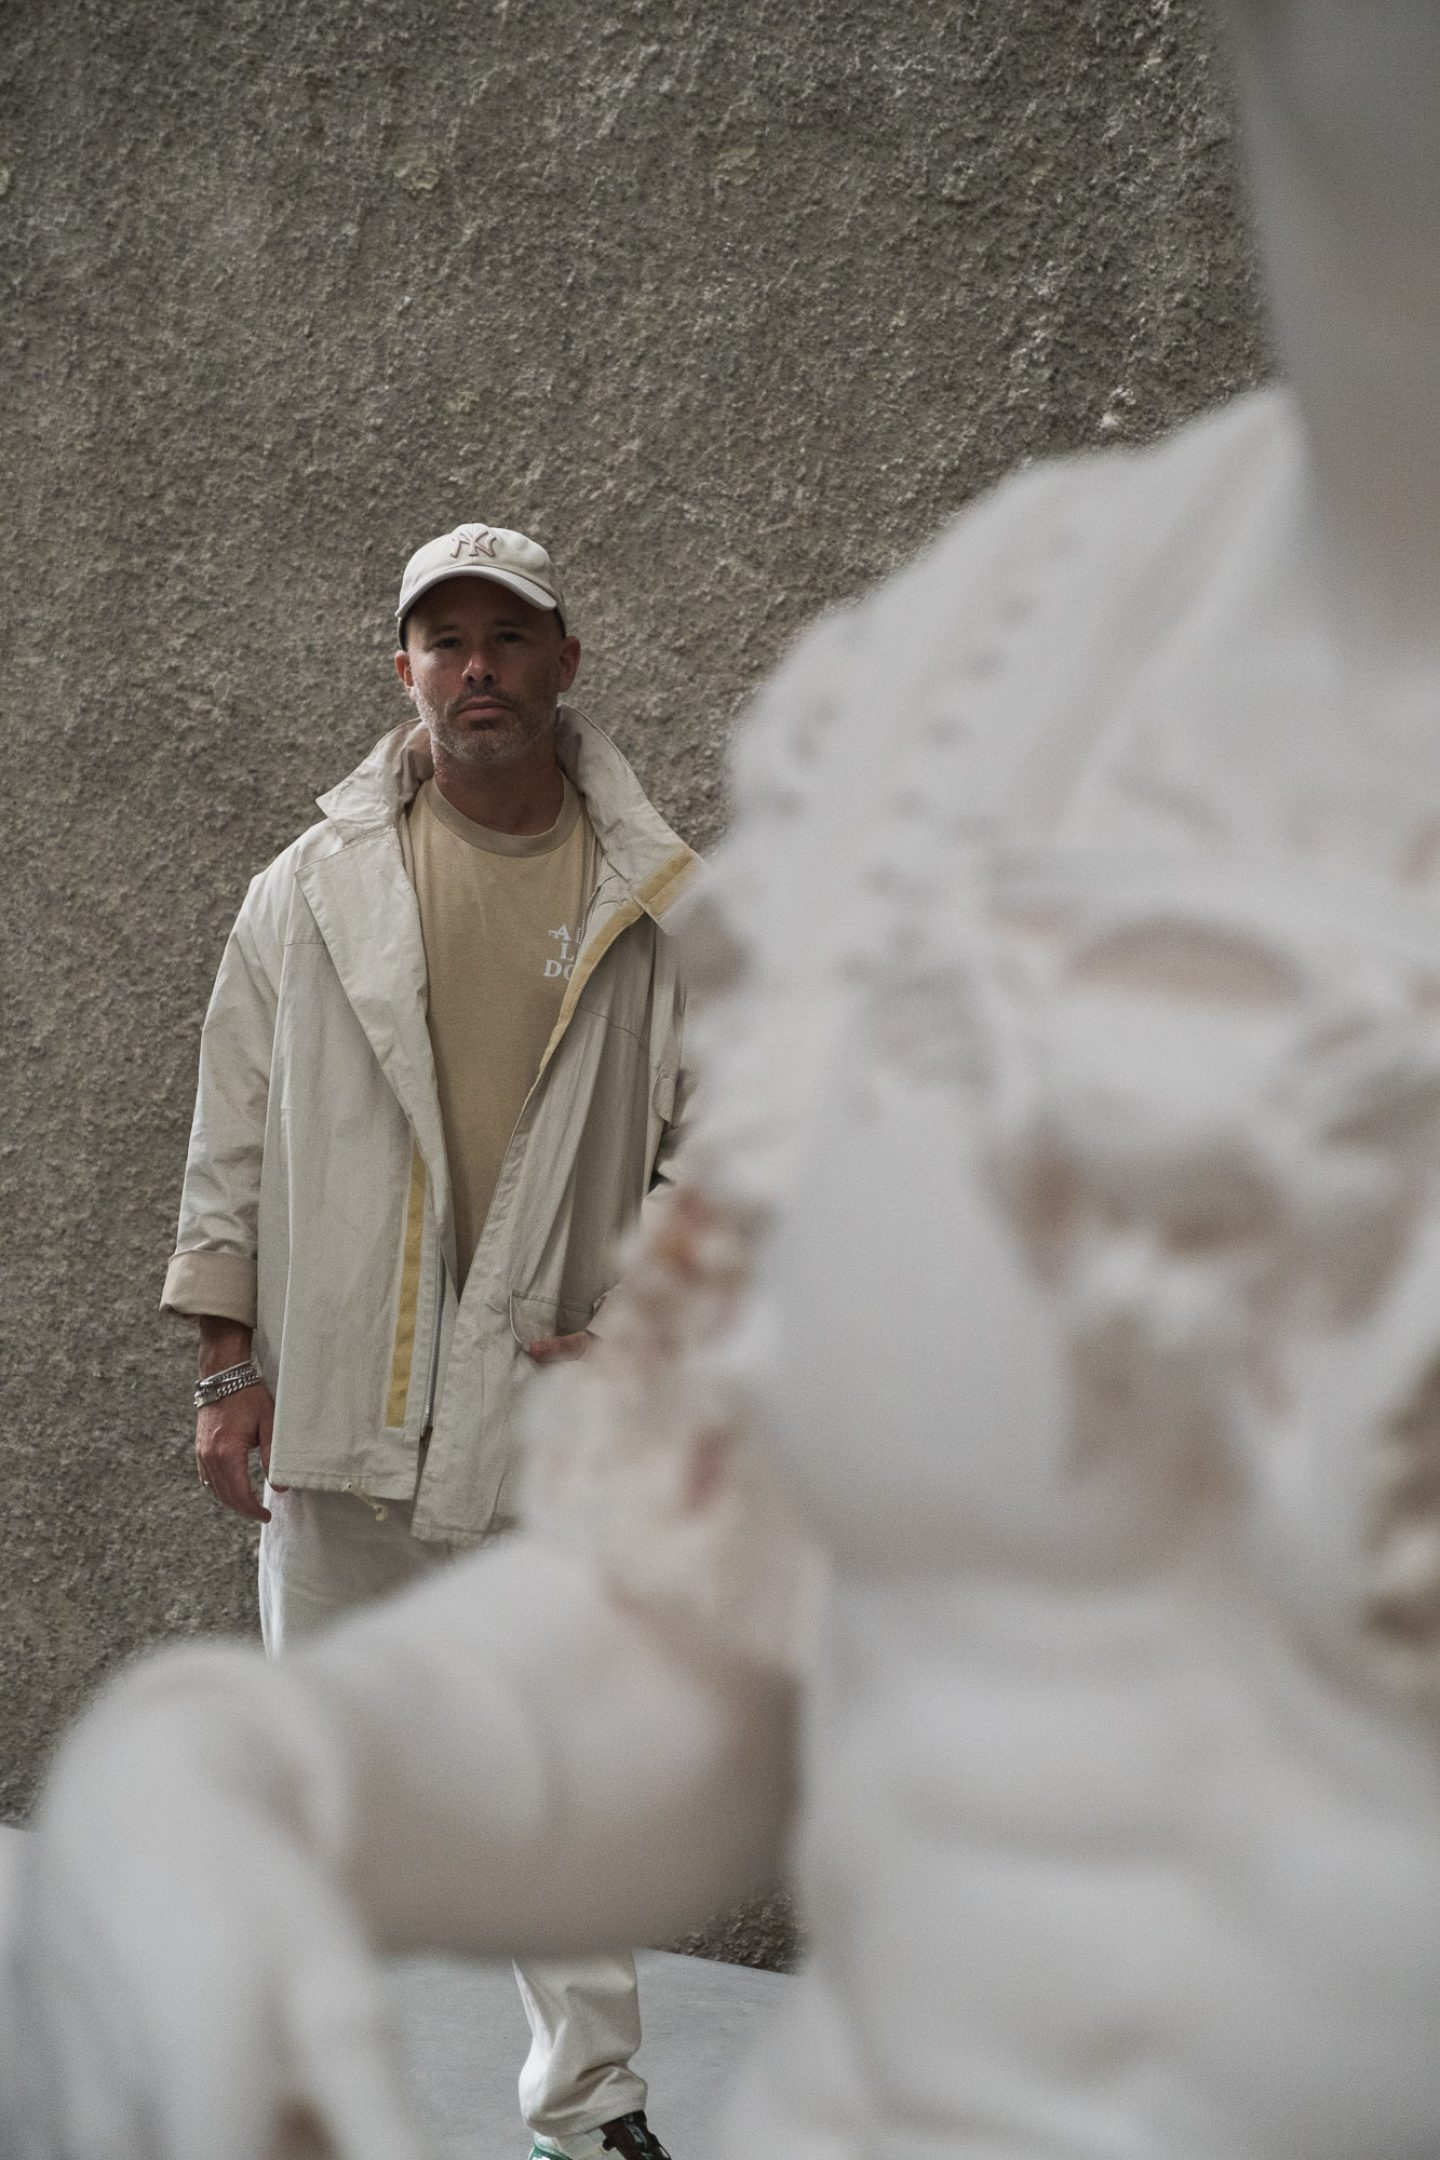 Daniel-Arsham-Koenig-Galerie-Clemens-Poloczek-IGNANT-004